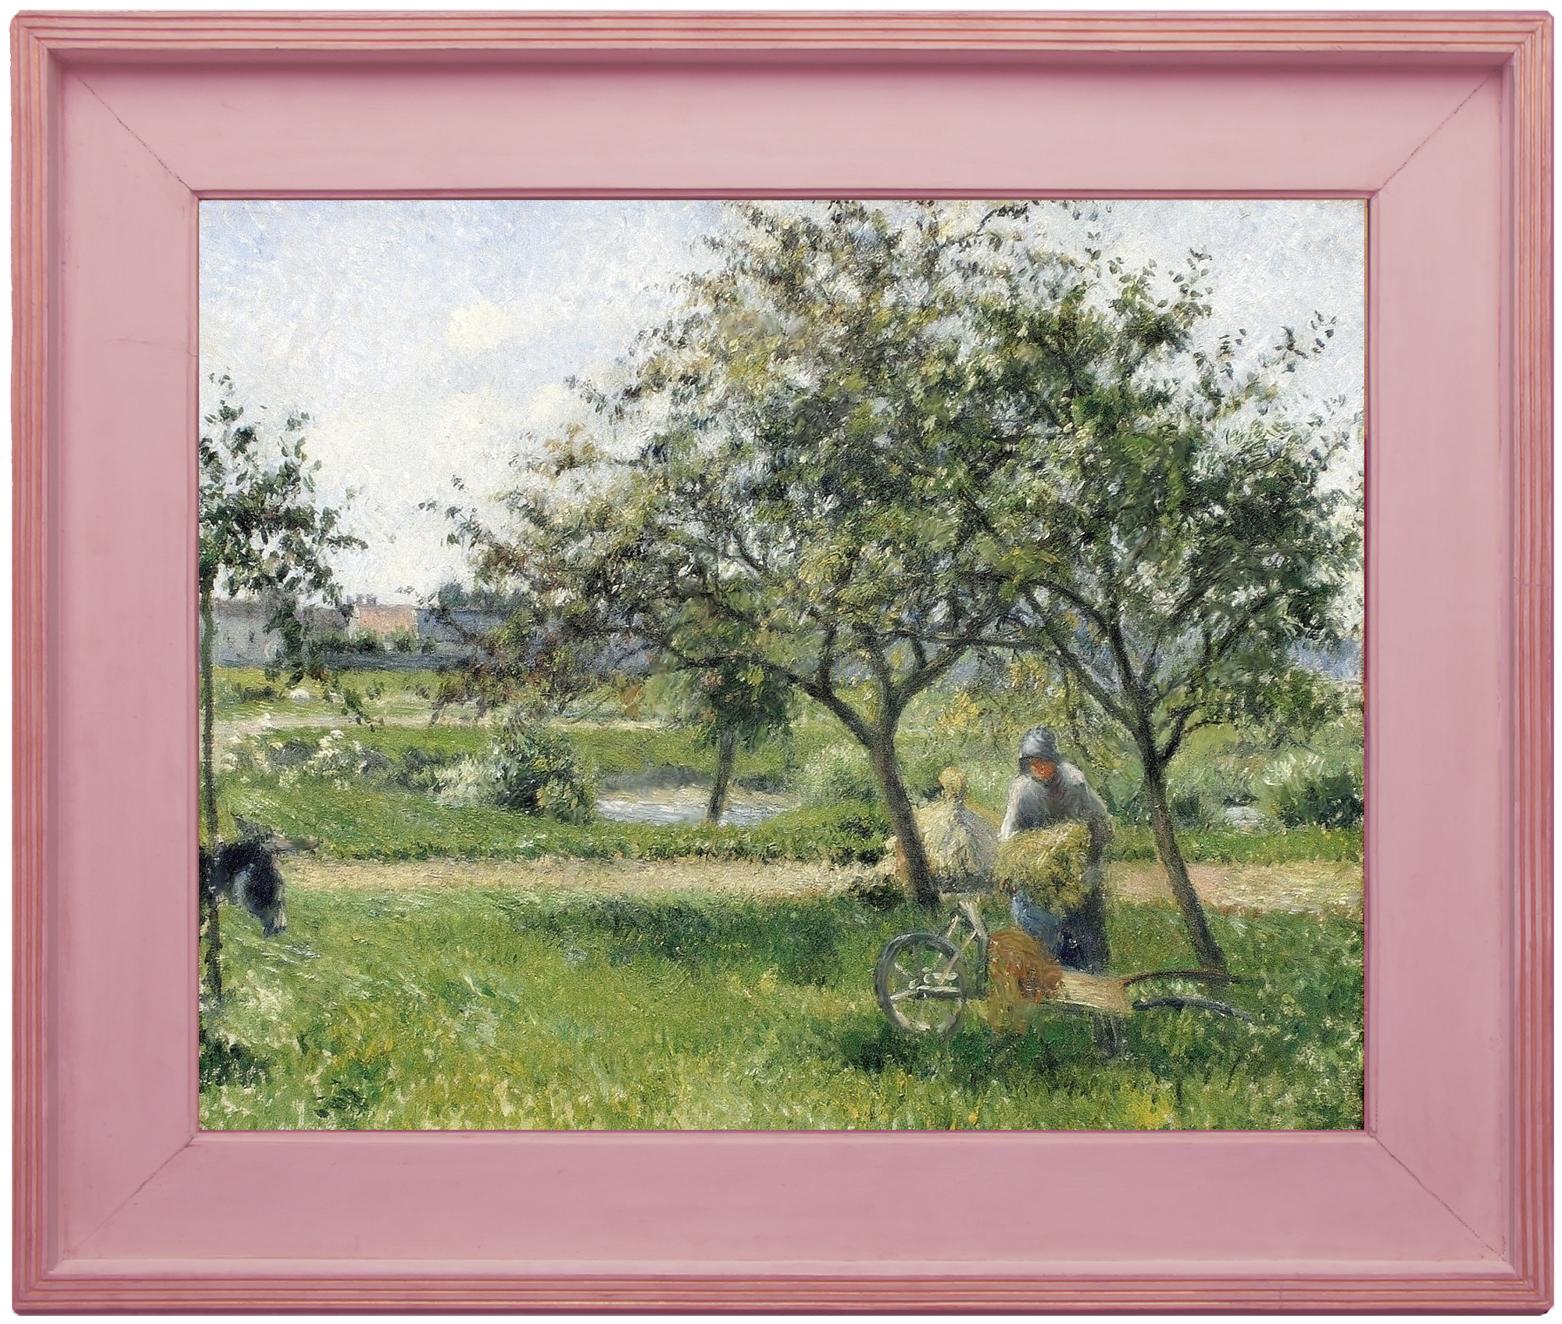 Рис.31 Камиль Писсарро (1830-1903), La brouette dans un verger , 1879, в раме Дега